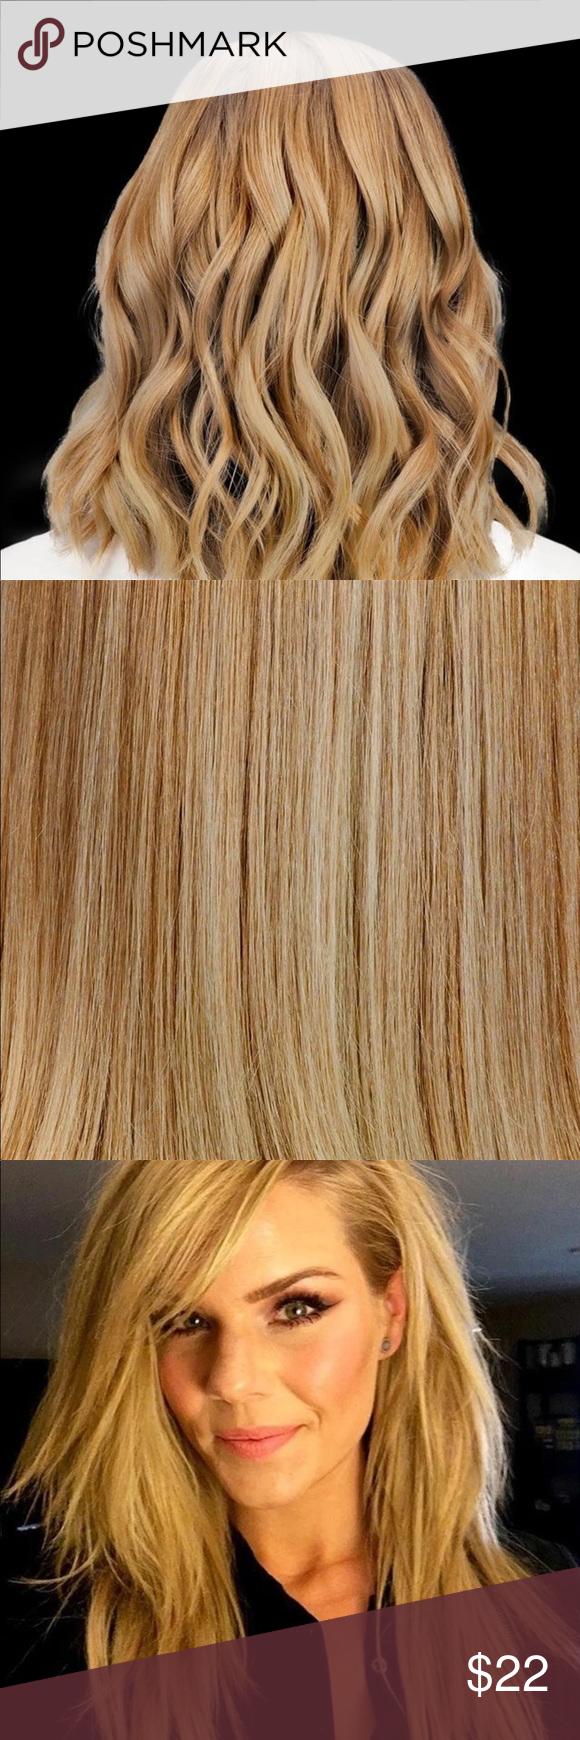 New Madison Reed Hair Dye kit Blonde Gallery